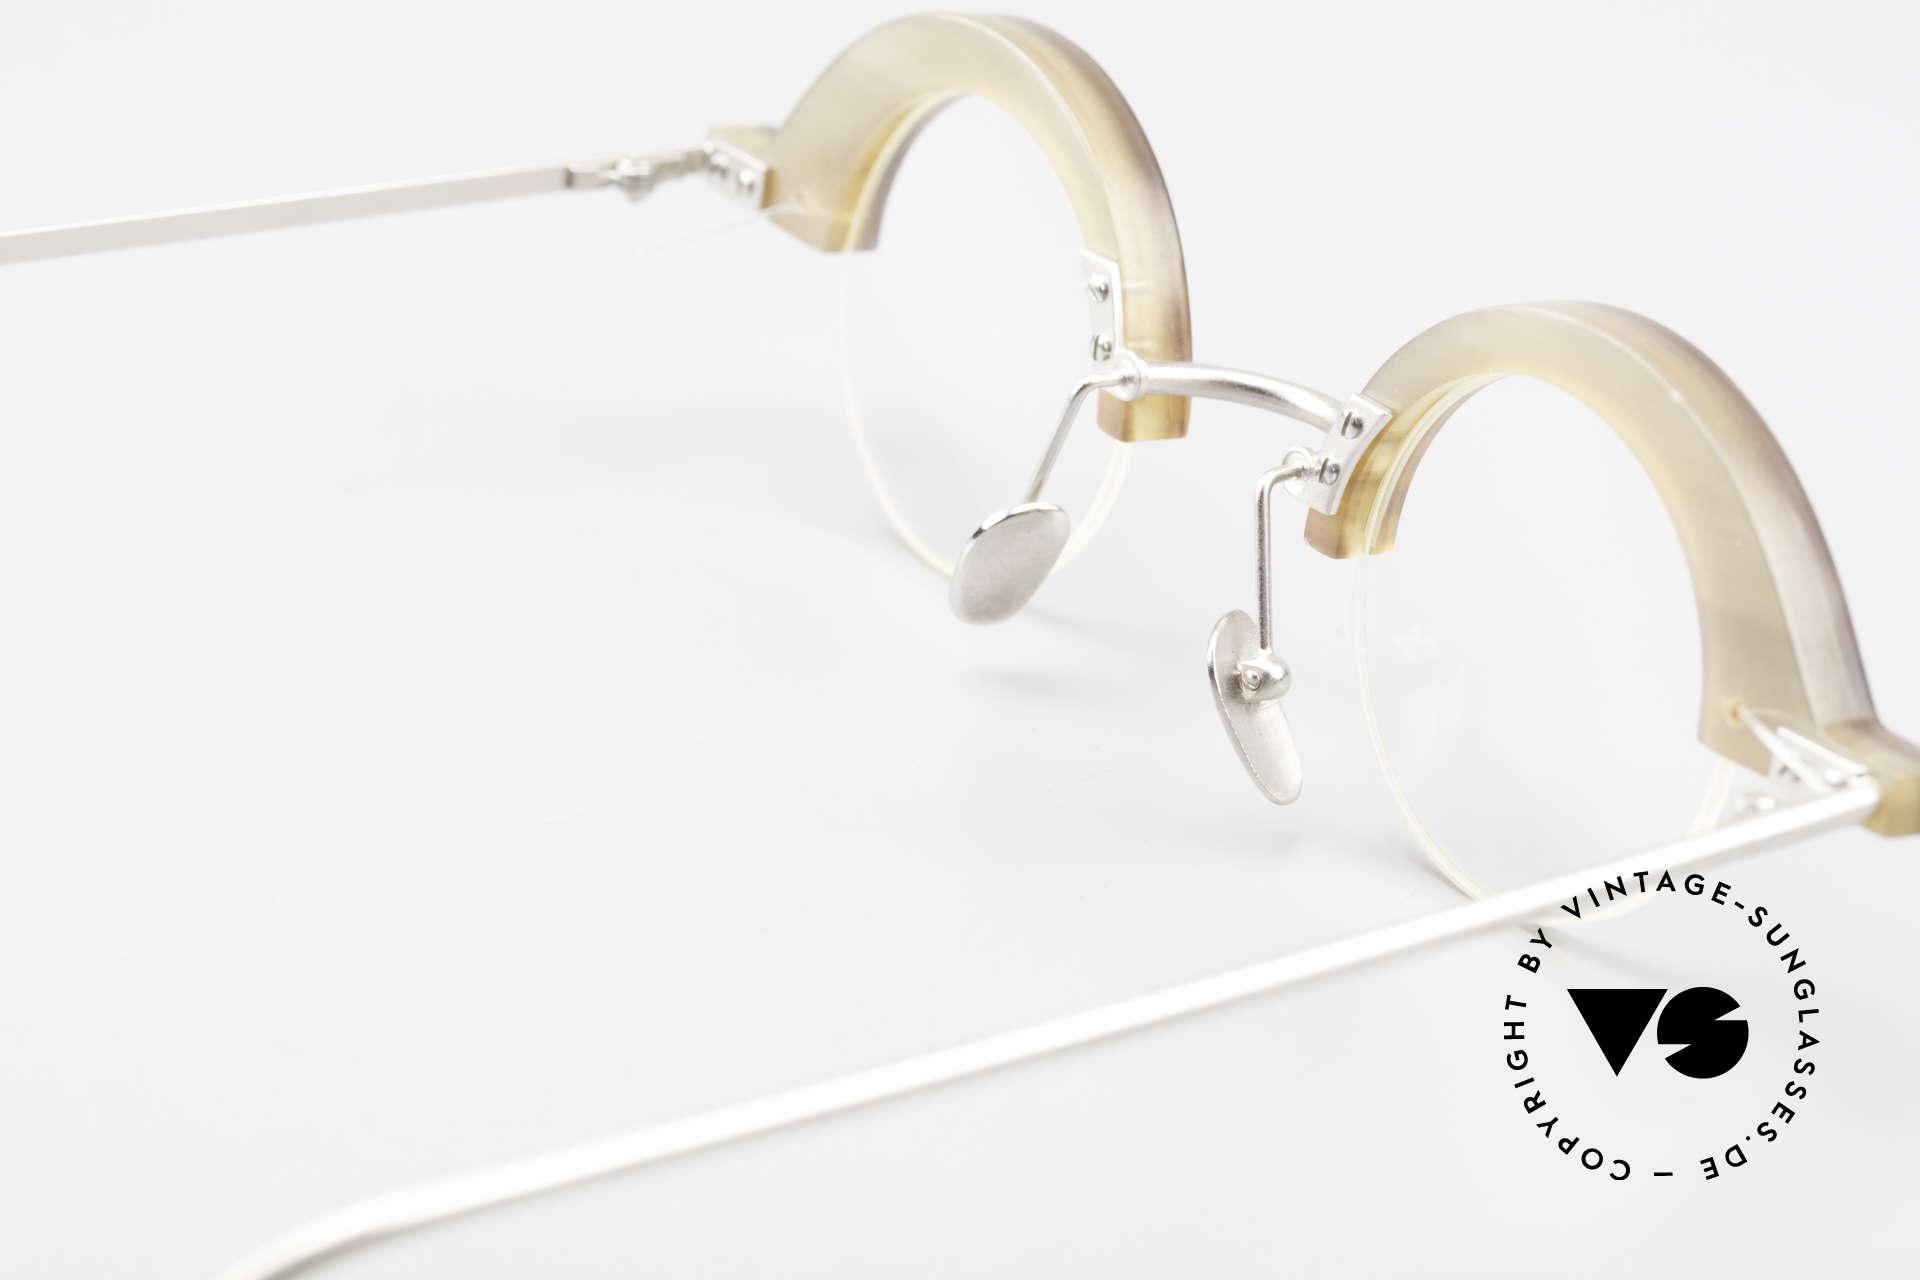 B. Angeletti Baal Redesign Genuine Horn Glasses 1994, never been worn; made for optical lenses or sun lenses, Made for Men and Women